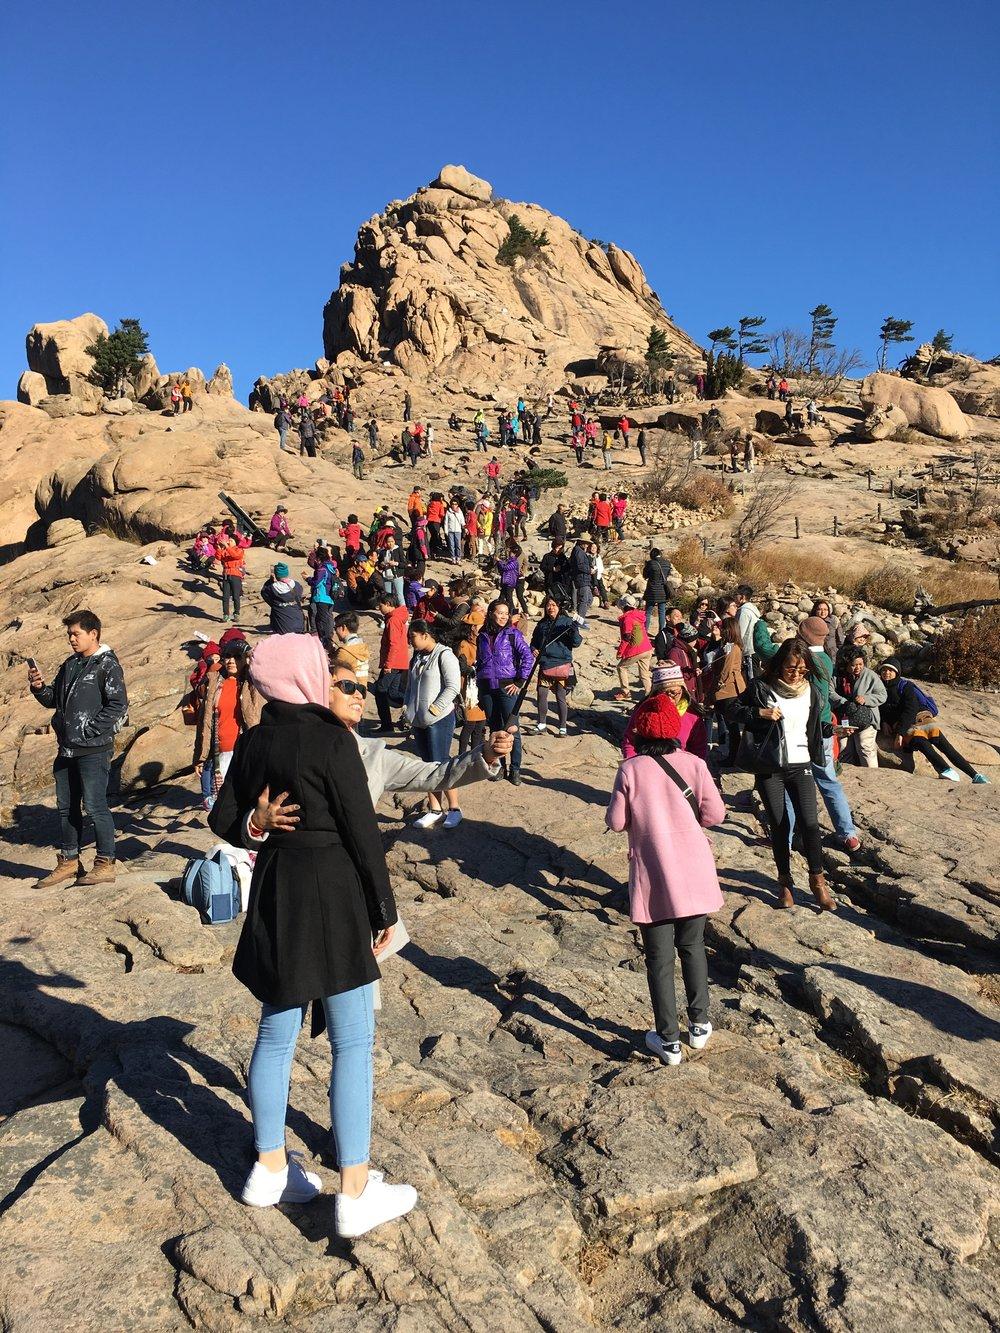 Crowds of tourists enjoying Seoraksan Mountain